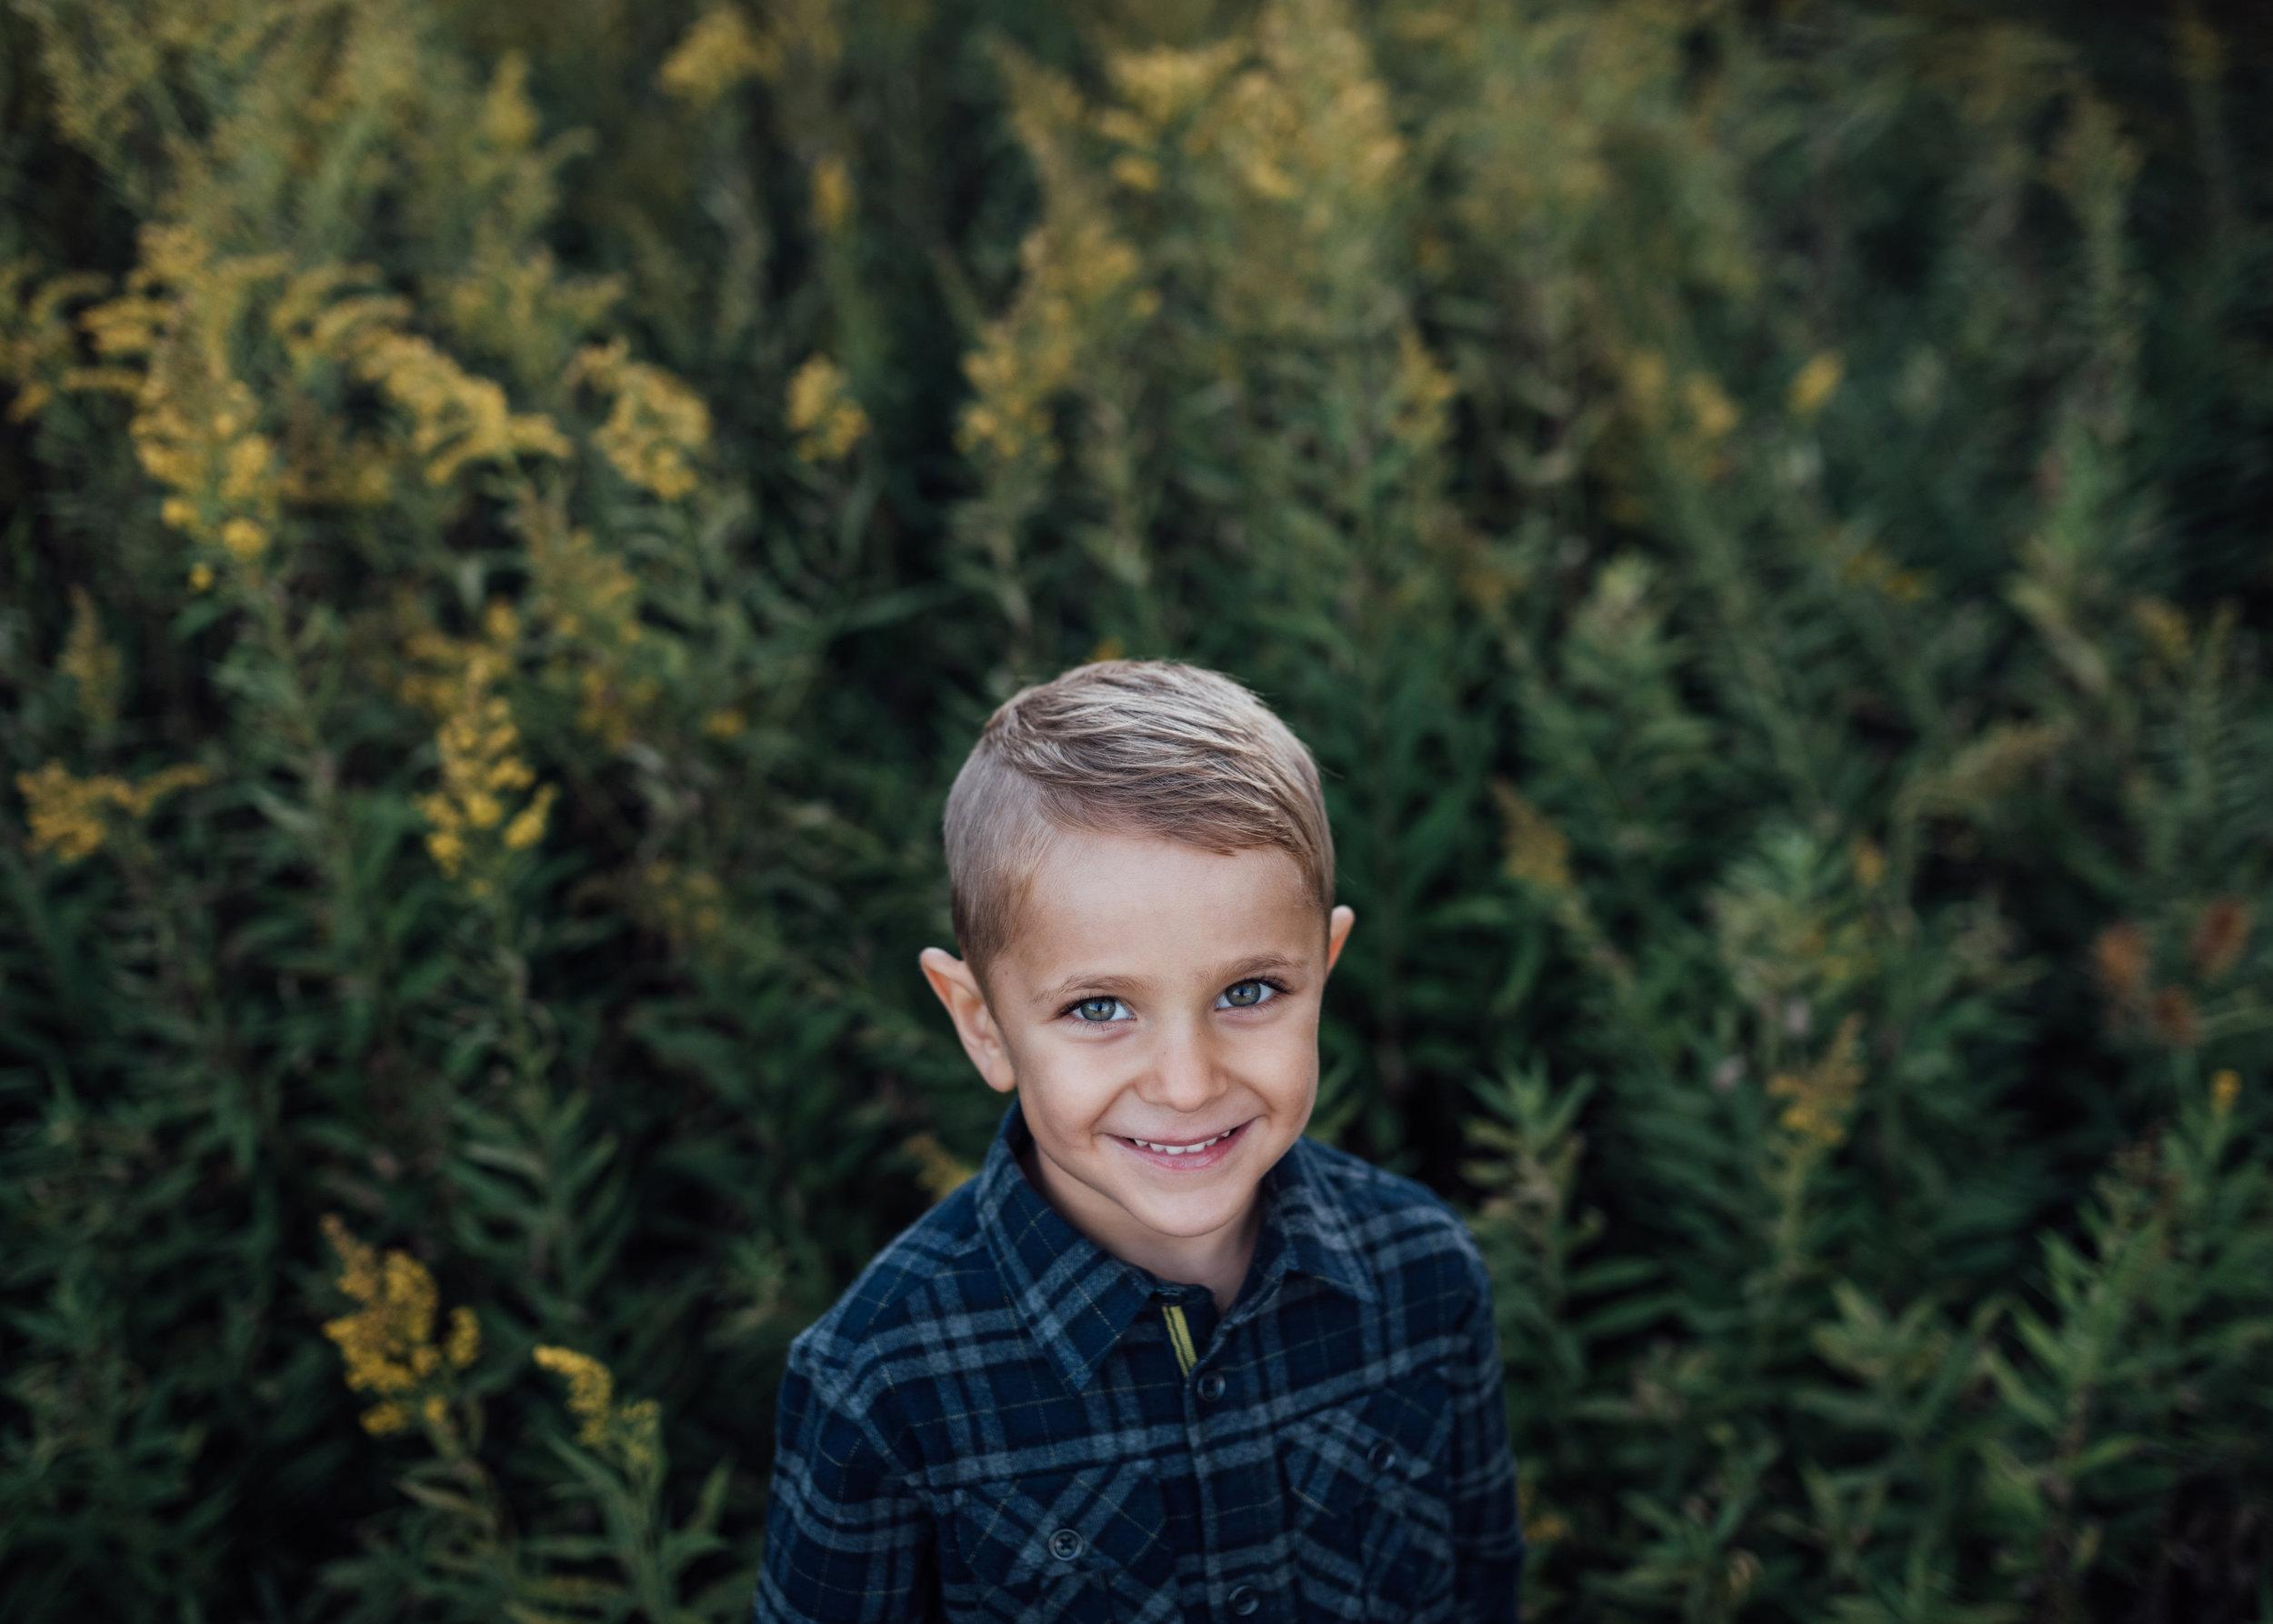 Children, family photographer, Milestone, Hamilton, Niagara, Beamsville, Grimsby